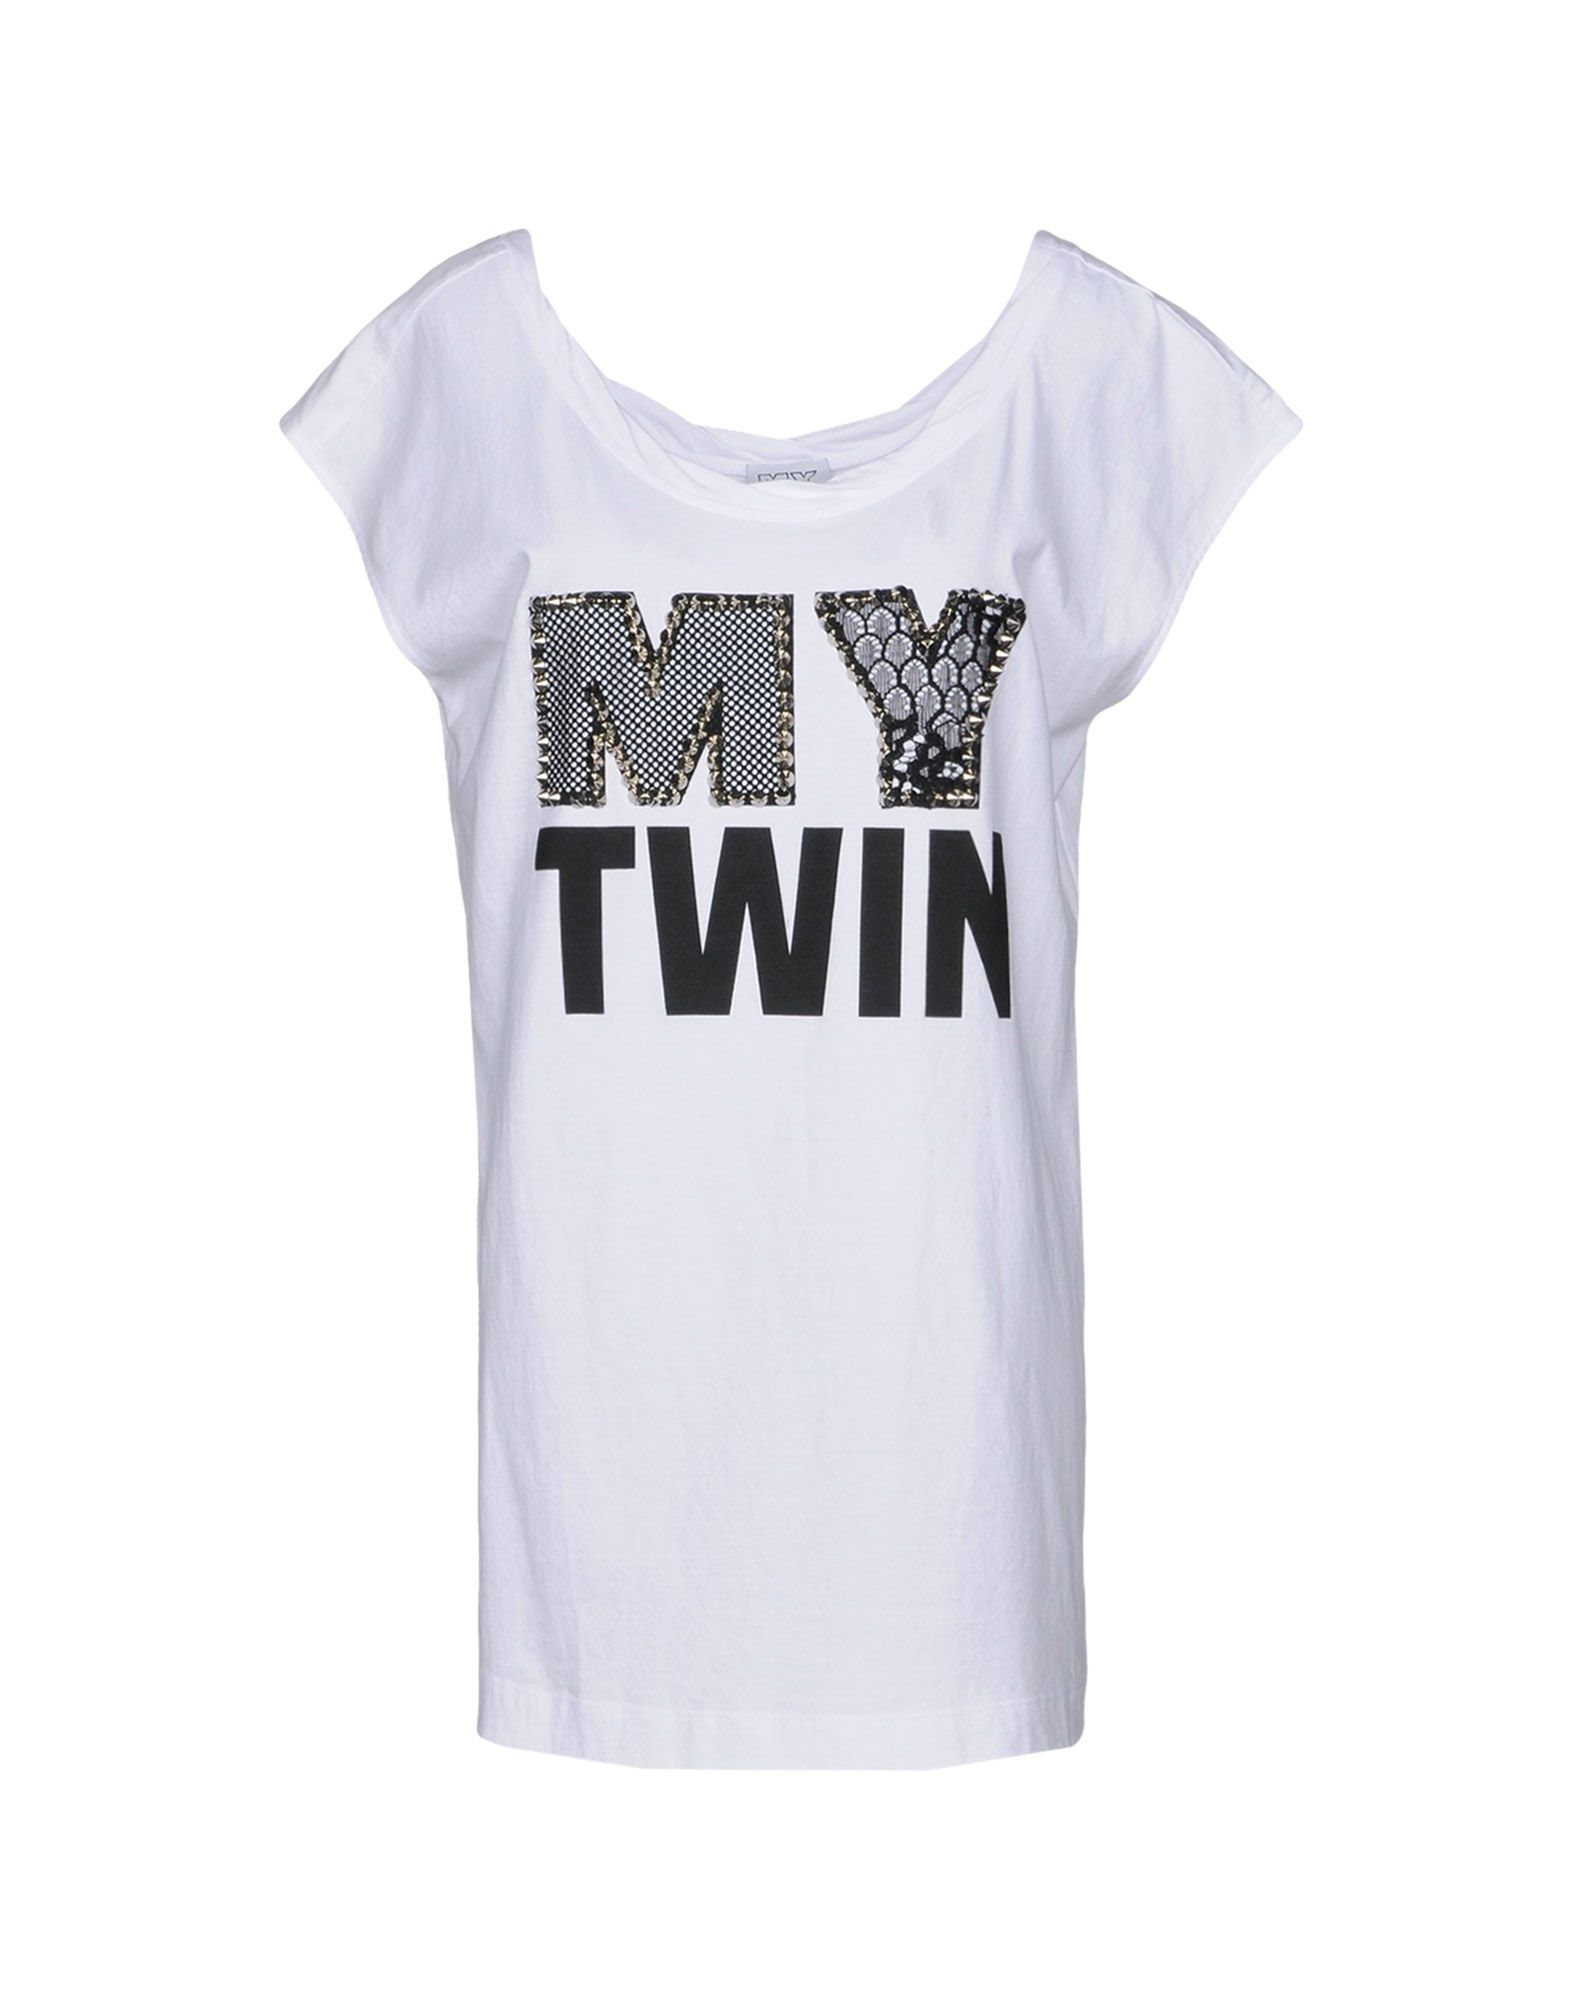 MY TWIN by TWIN SET Футболка twin set футболка с кружевом twin set j2a4fb 1014 кремовый m